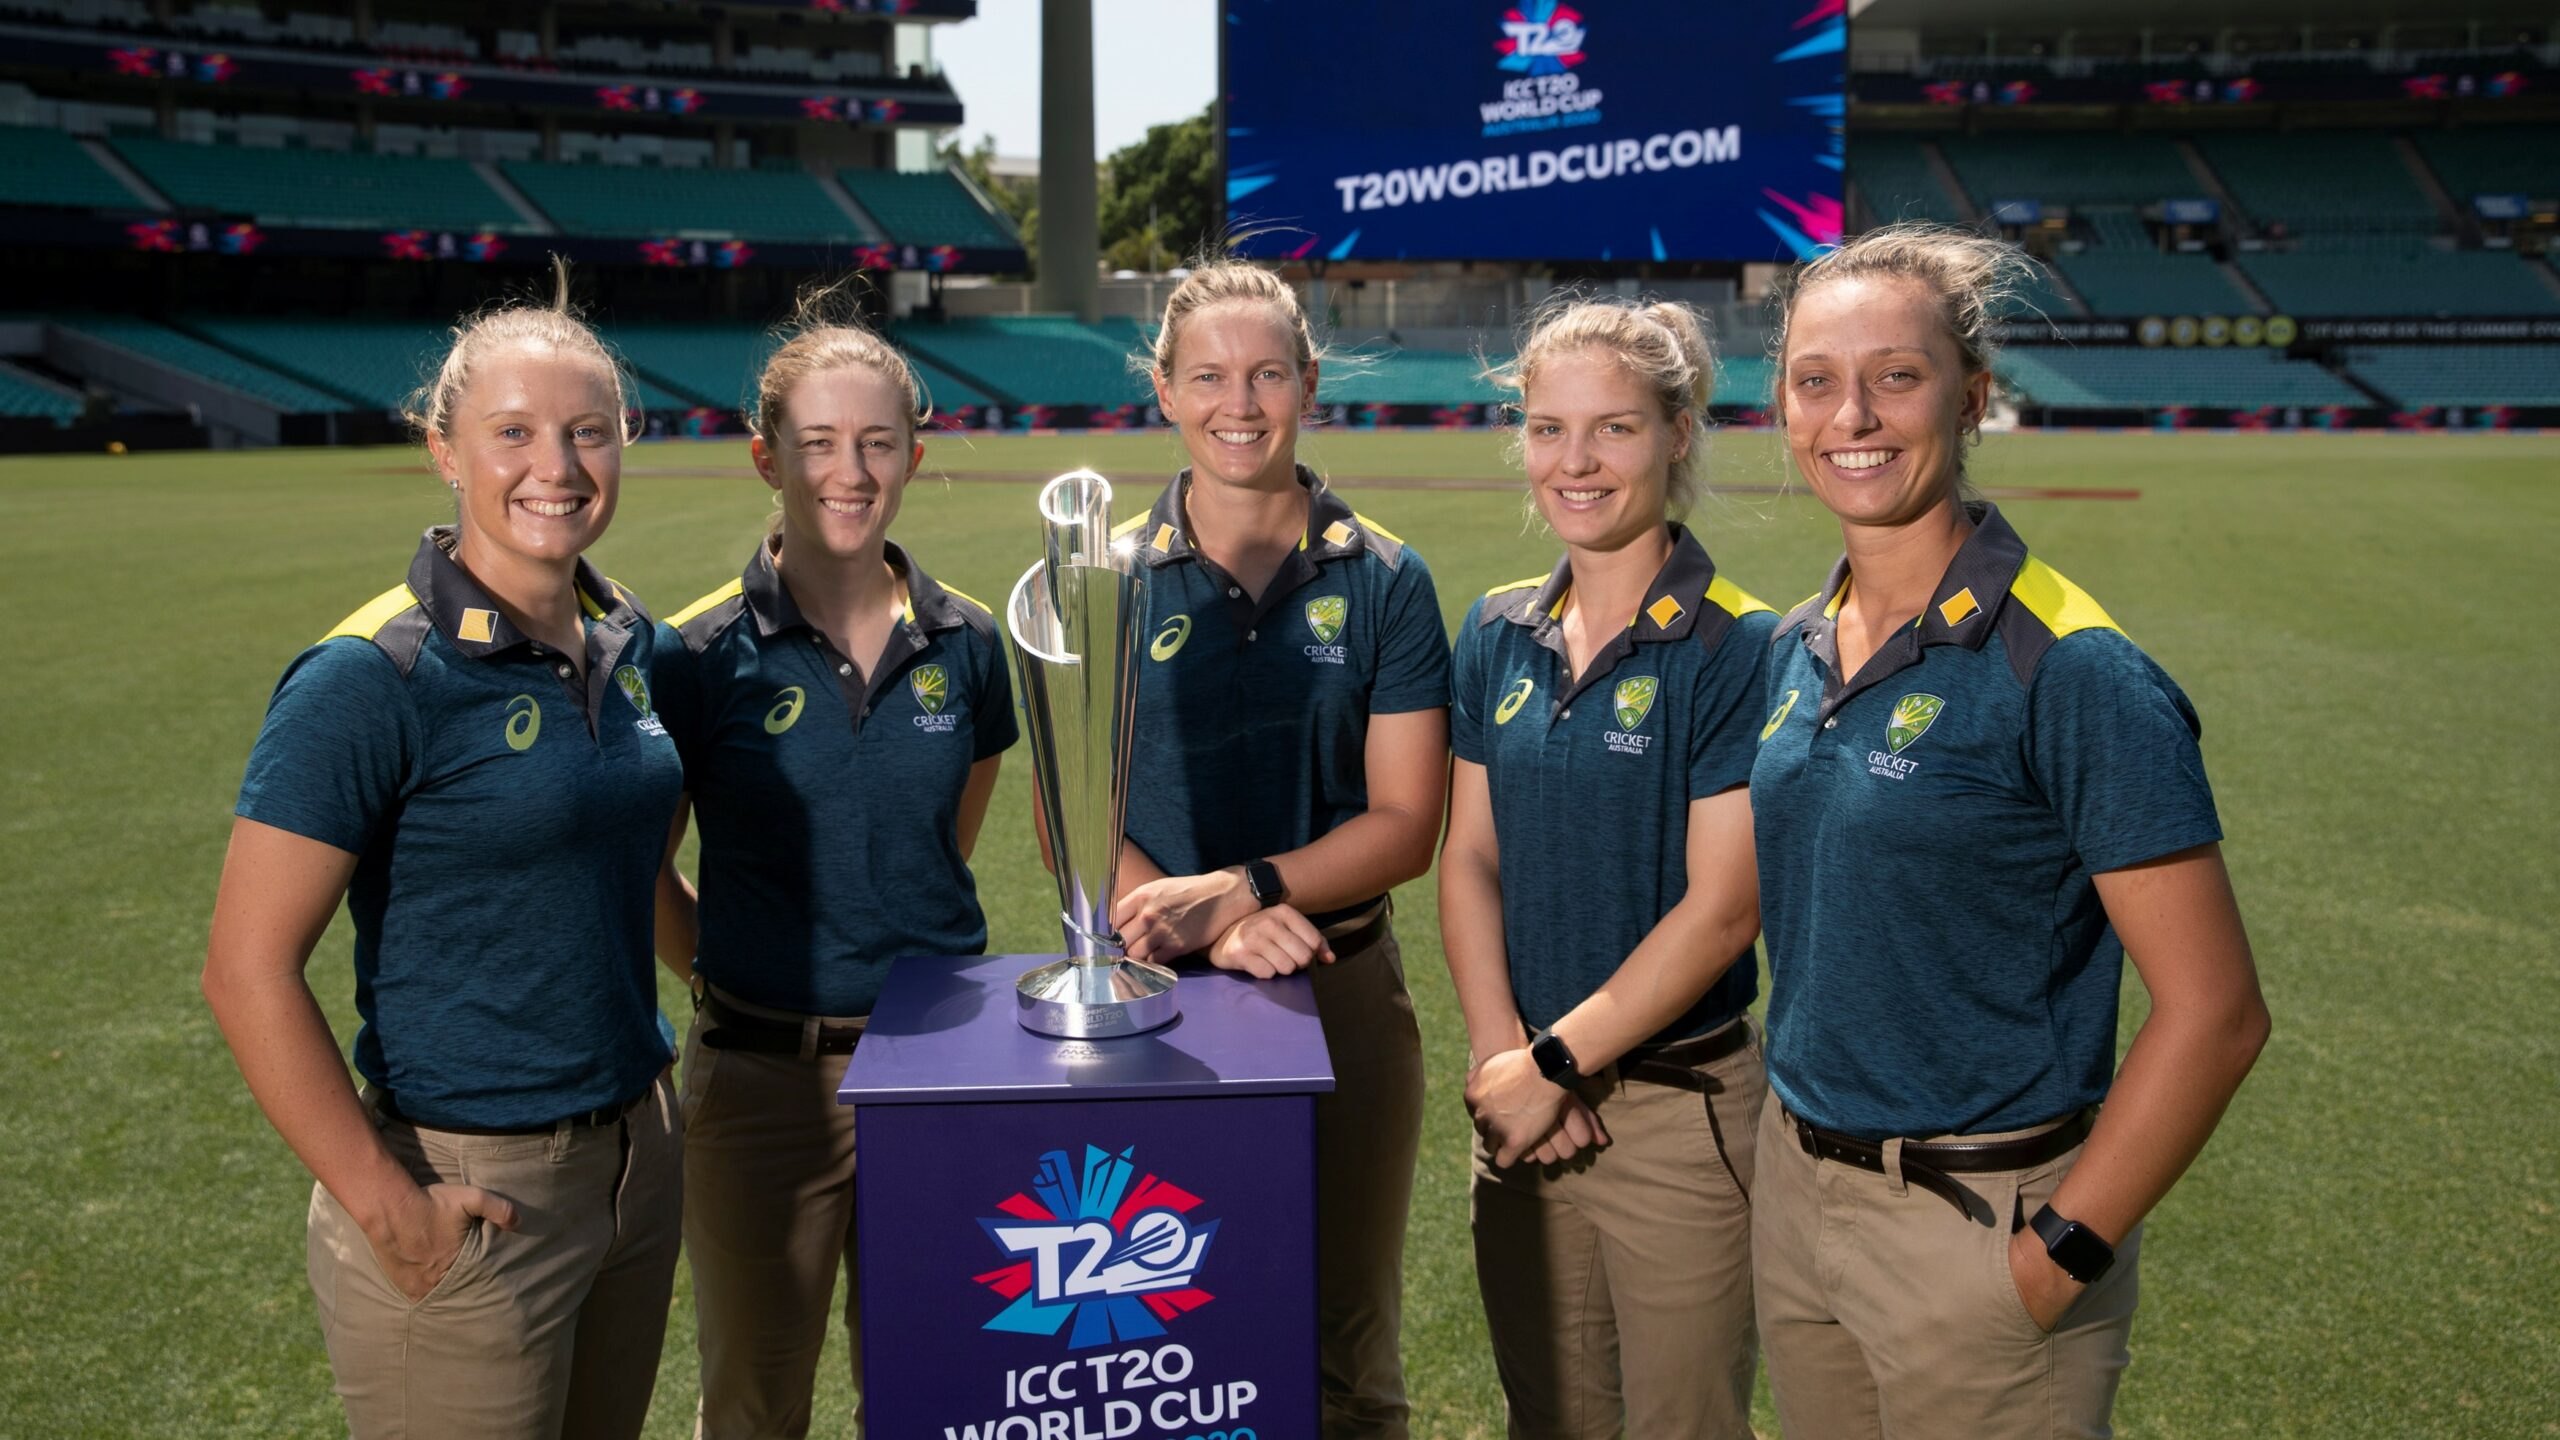 Top 10 the most Beautiful International Women Cricketer 2021